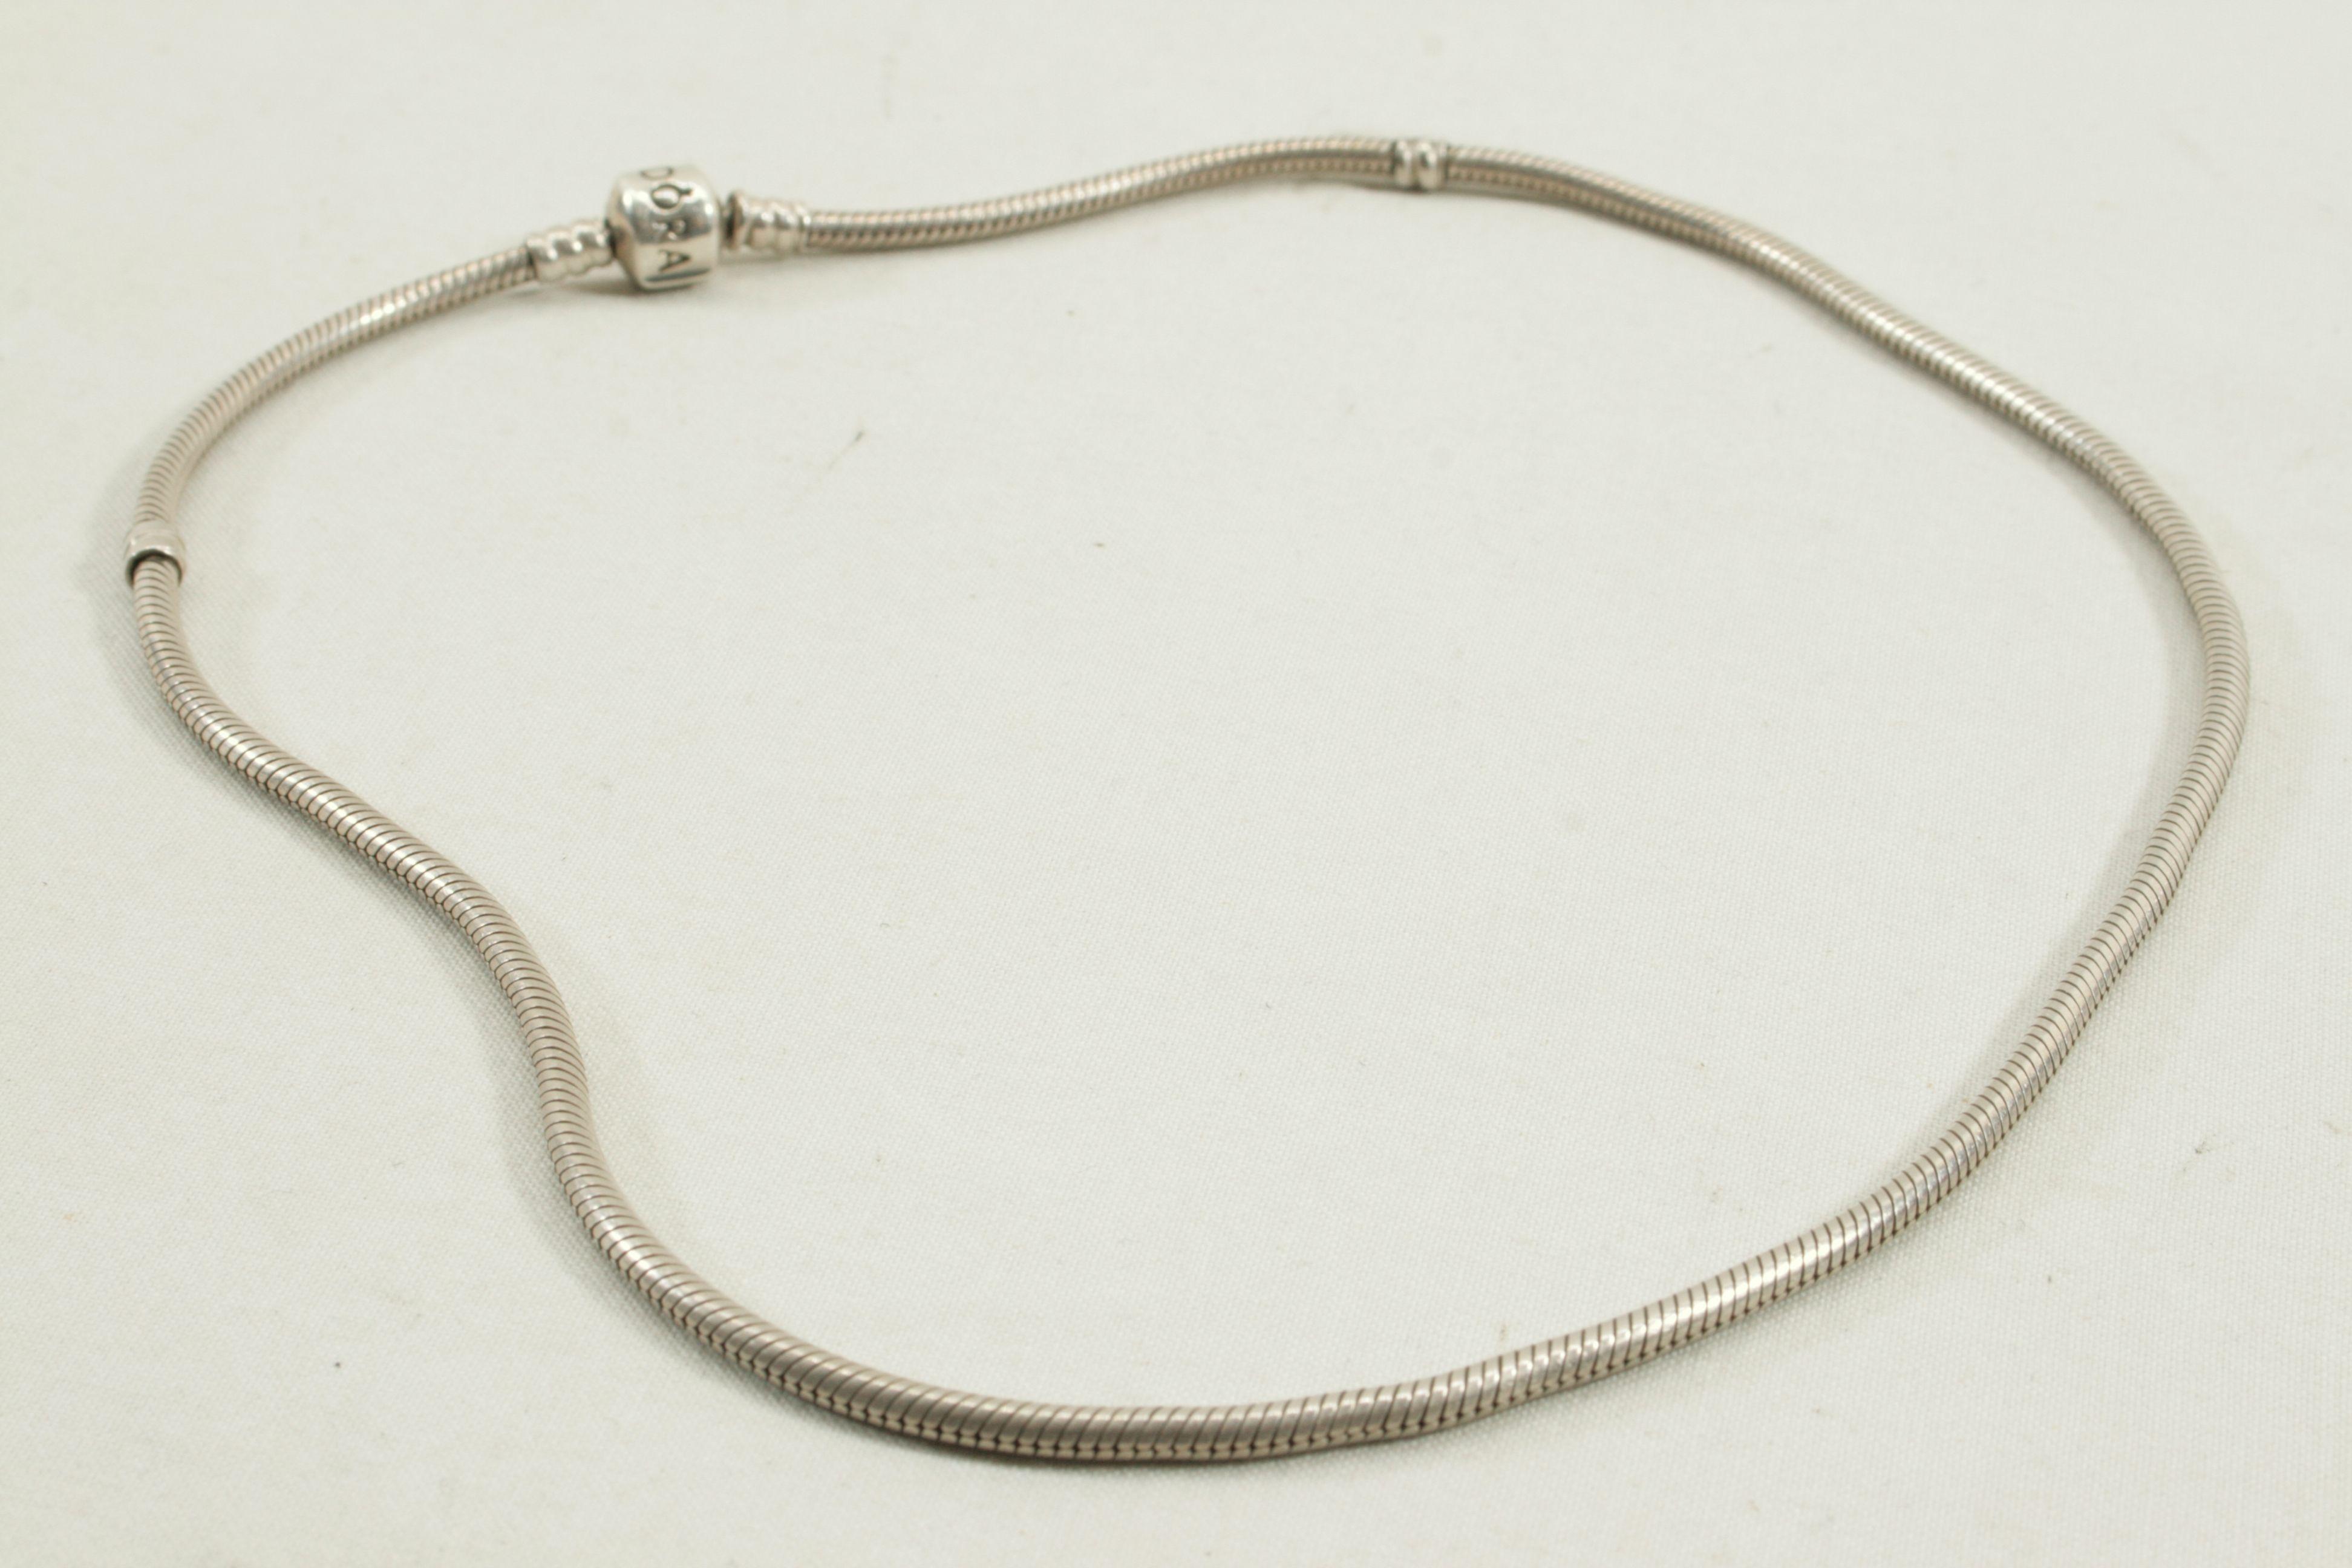 5ced4bbca Genuine Pandora Sterling Silver Charm Necklace - 45cm